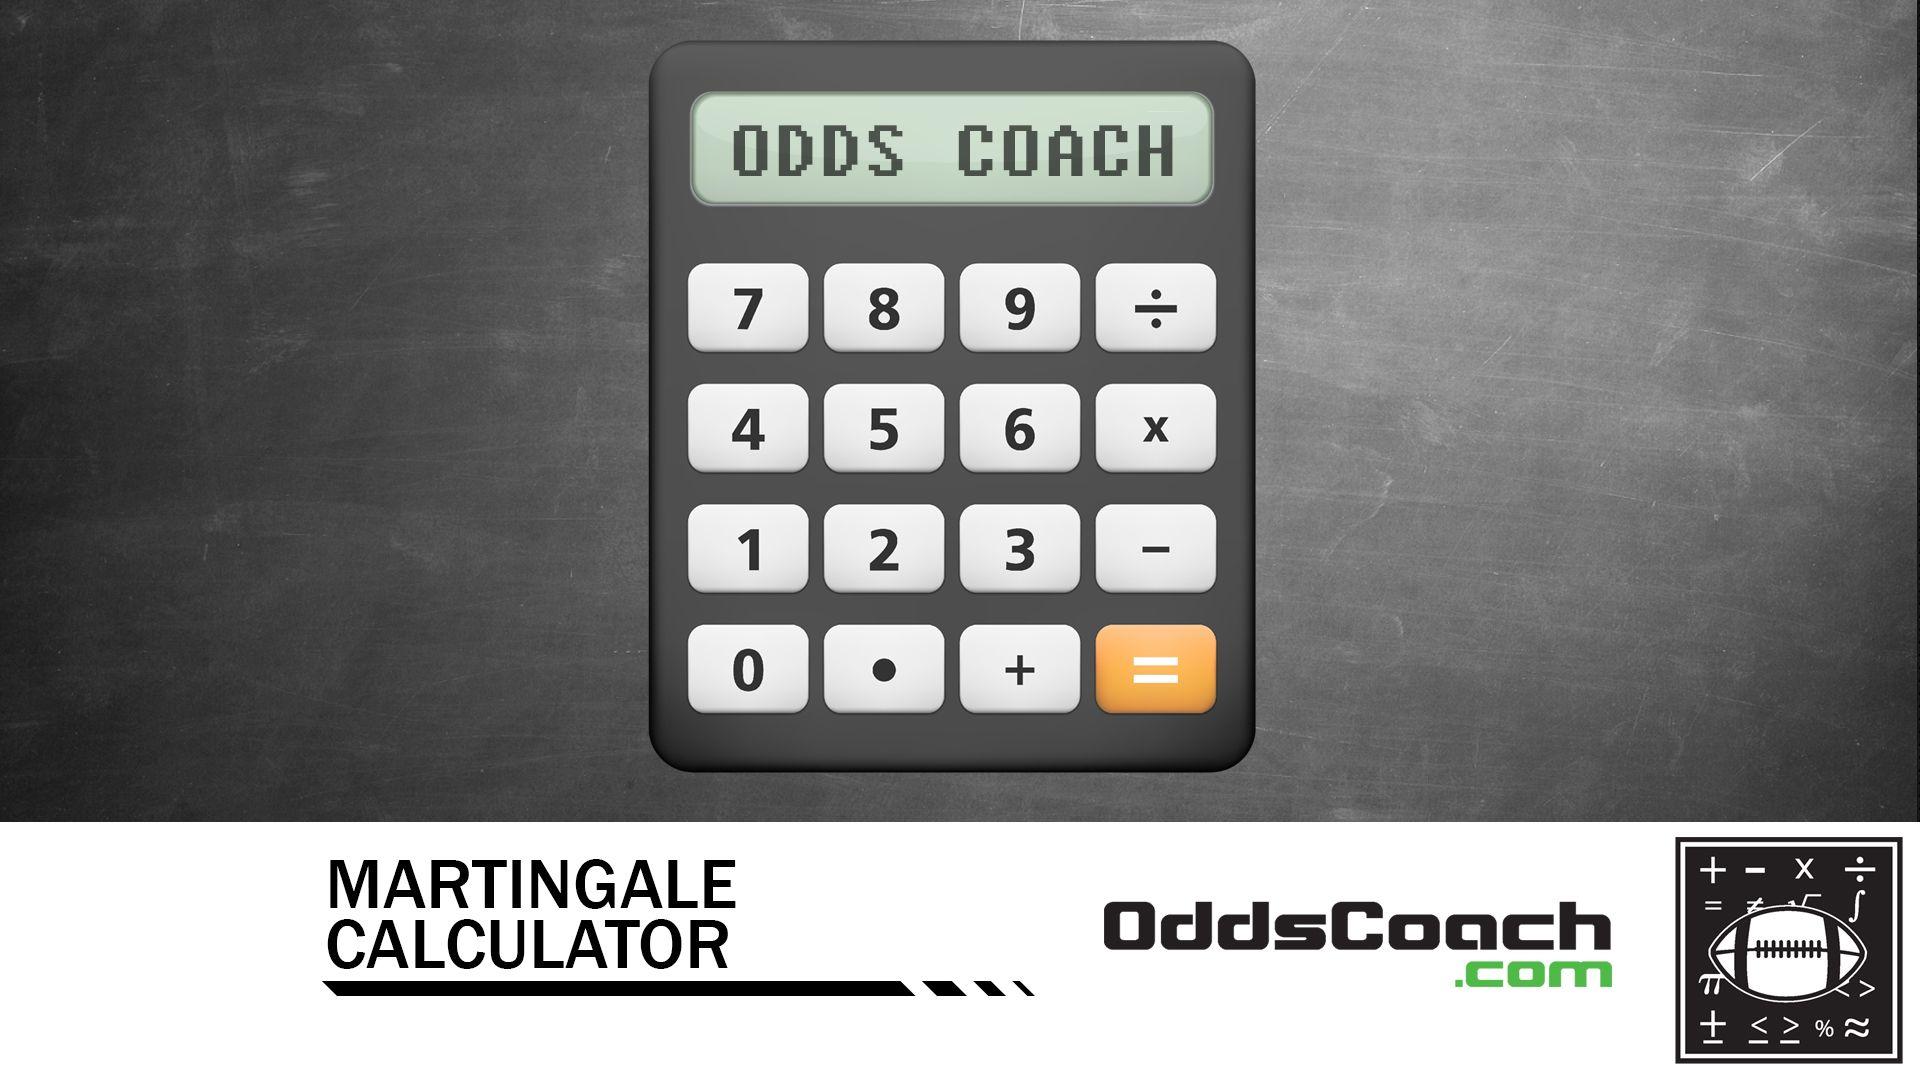 Martingale betting calculator american totesport betting vouchers crossword